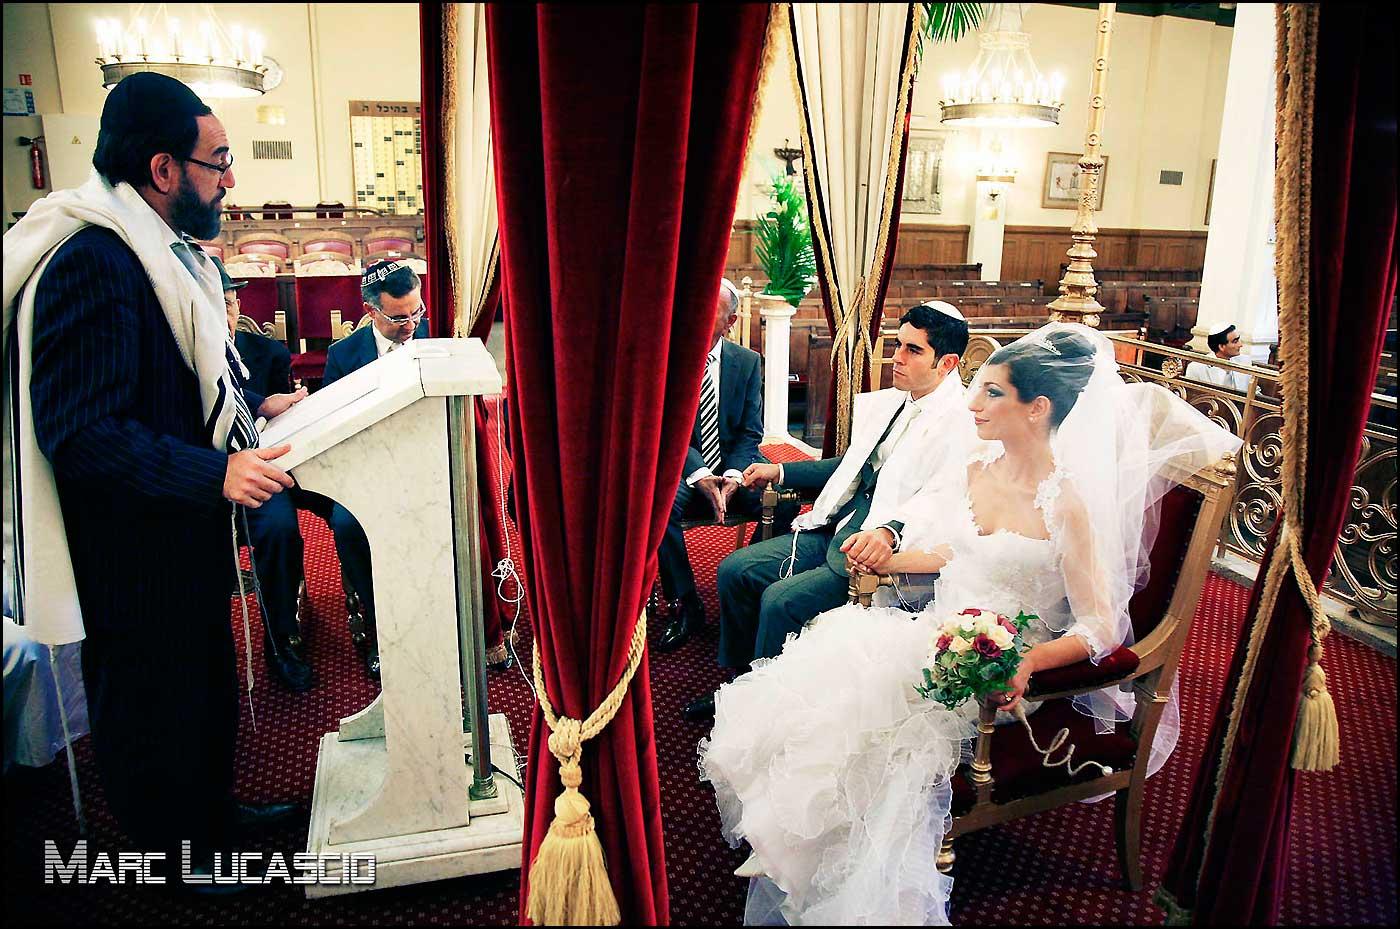 Le rabbin et les futurs mariés